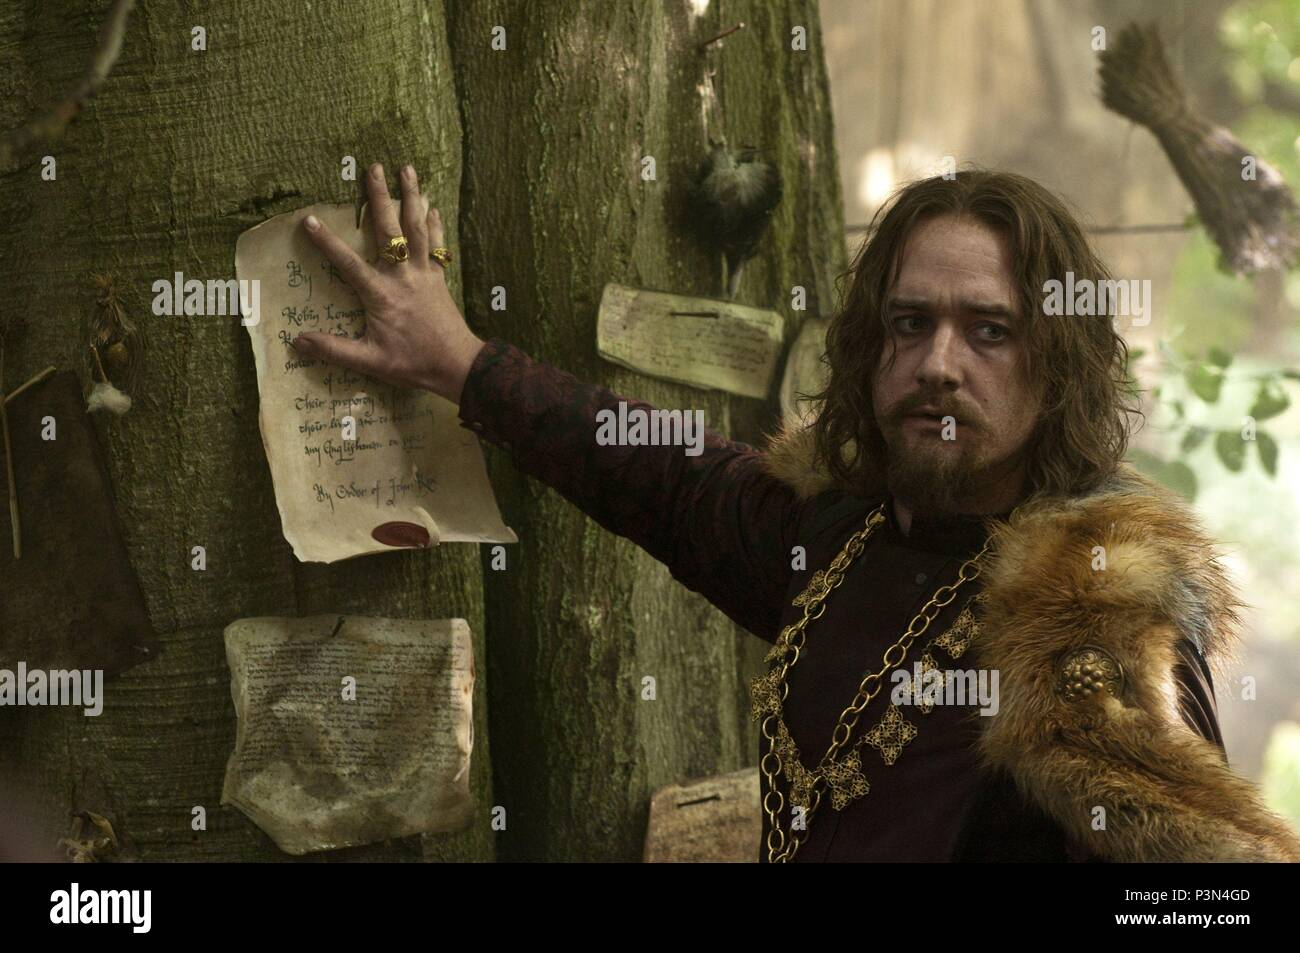 Ridley Scott Matthew Macfadyen High Resolution Stock Photography And Images Alamy